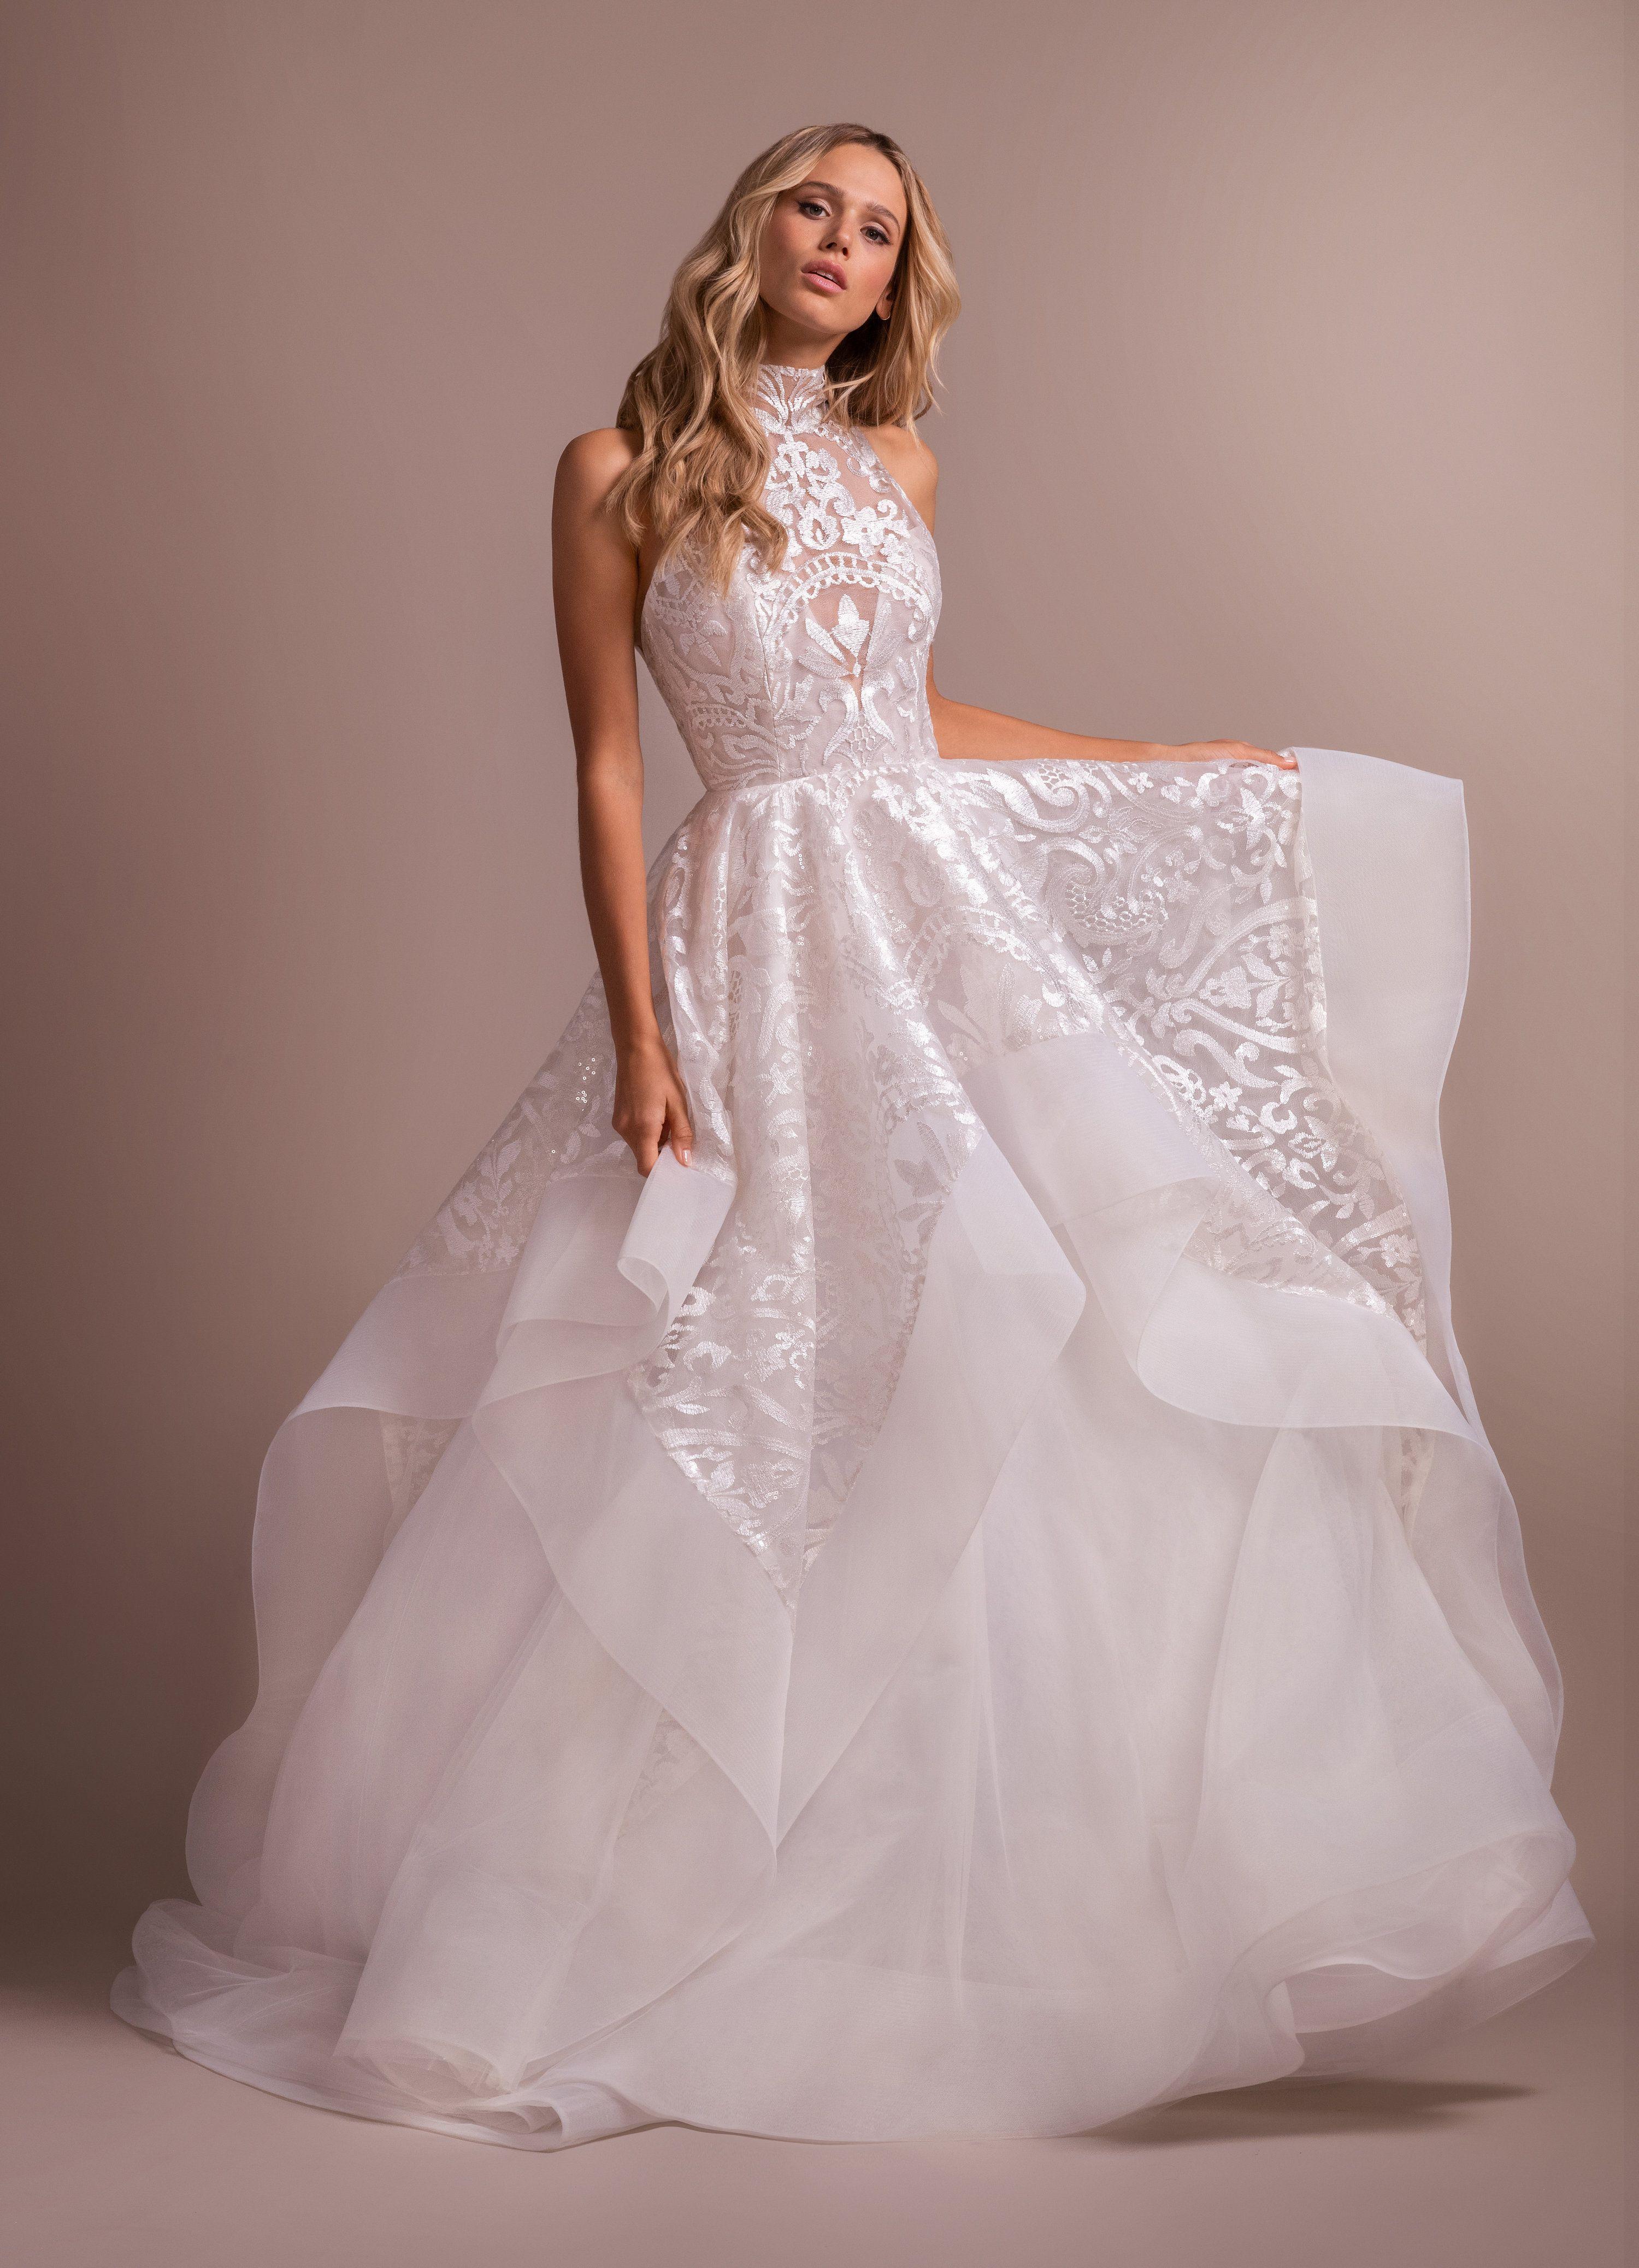 Hayley Paige Kylo Gown High Neck Wedding Dress Dallas Bridal Salon Wedding Dresses Kleinfeld High Neck Wedding Dress Ball Gowns Wedding